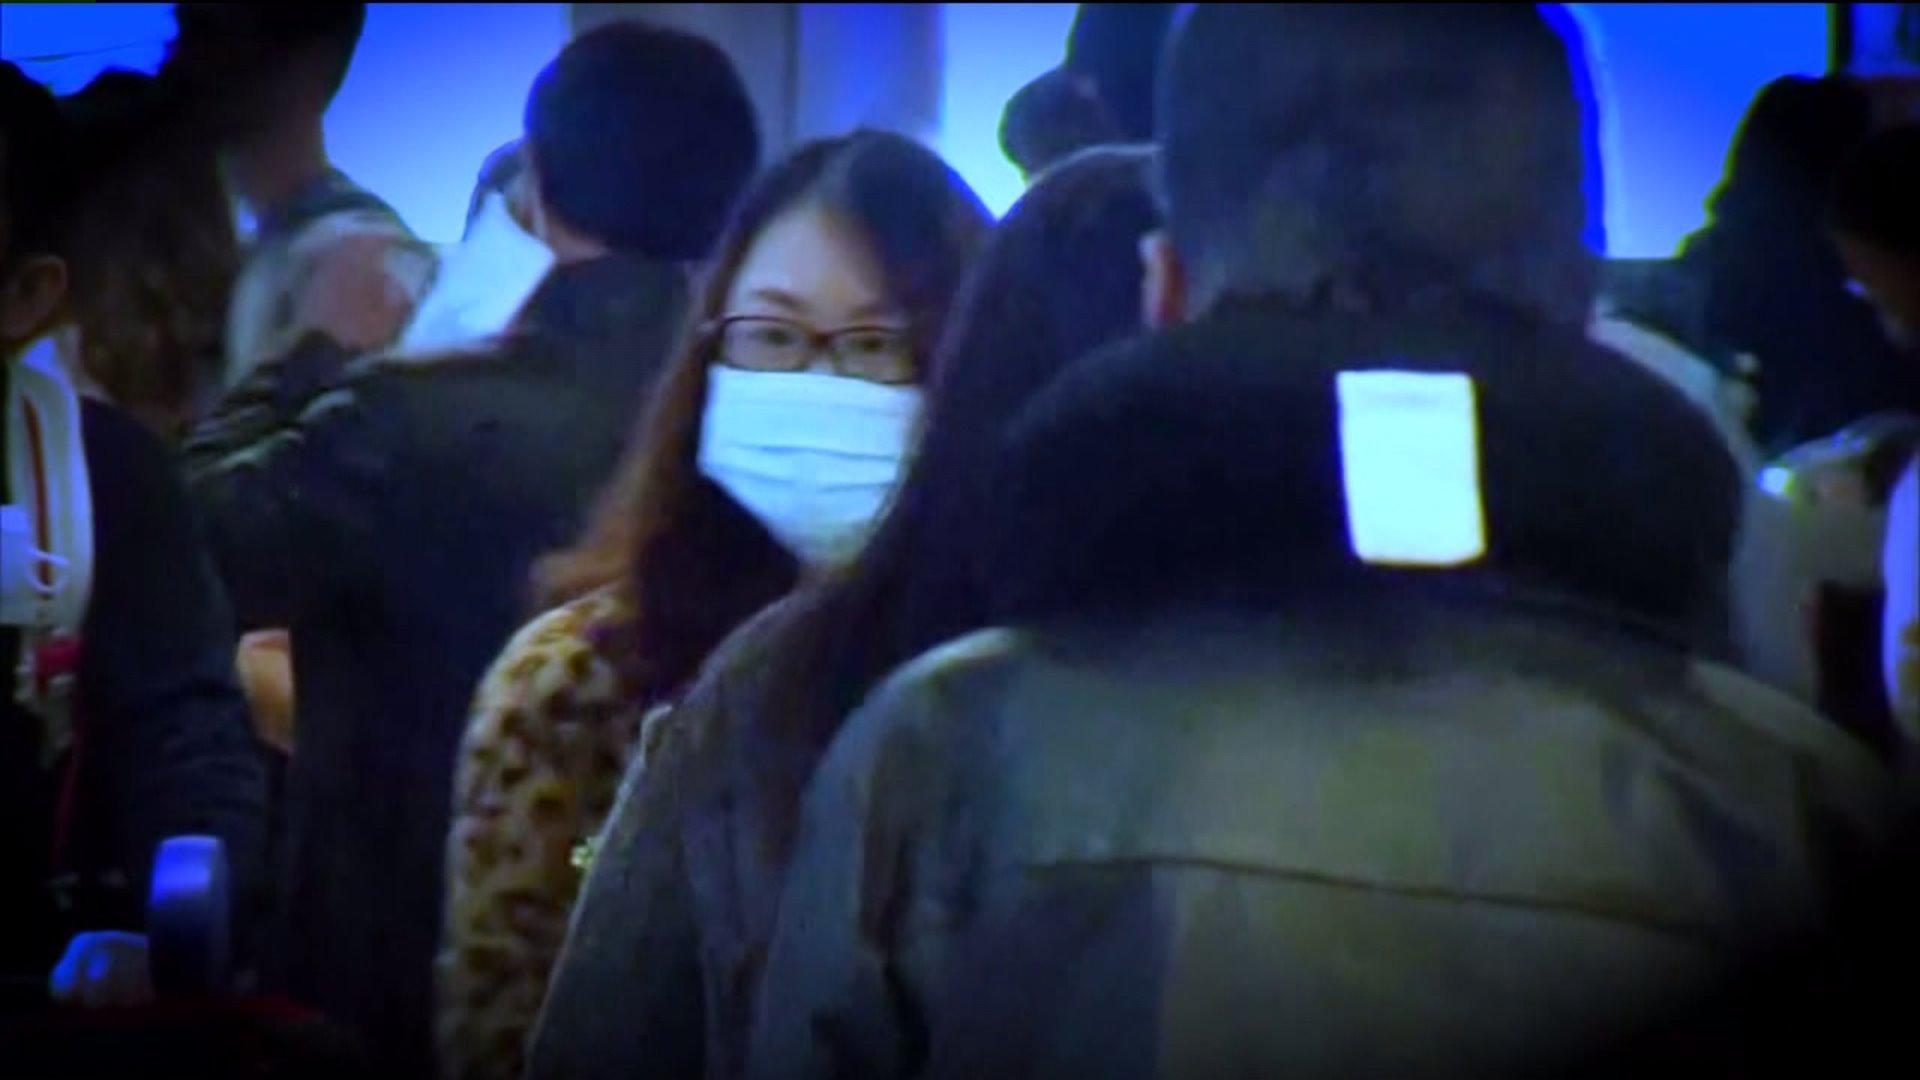 Wuhan Man Visiting Loveland Raises Money For Face Masks To Protect